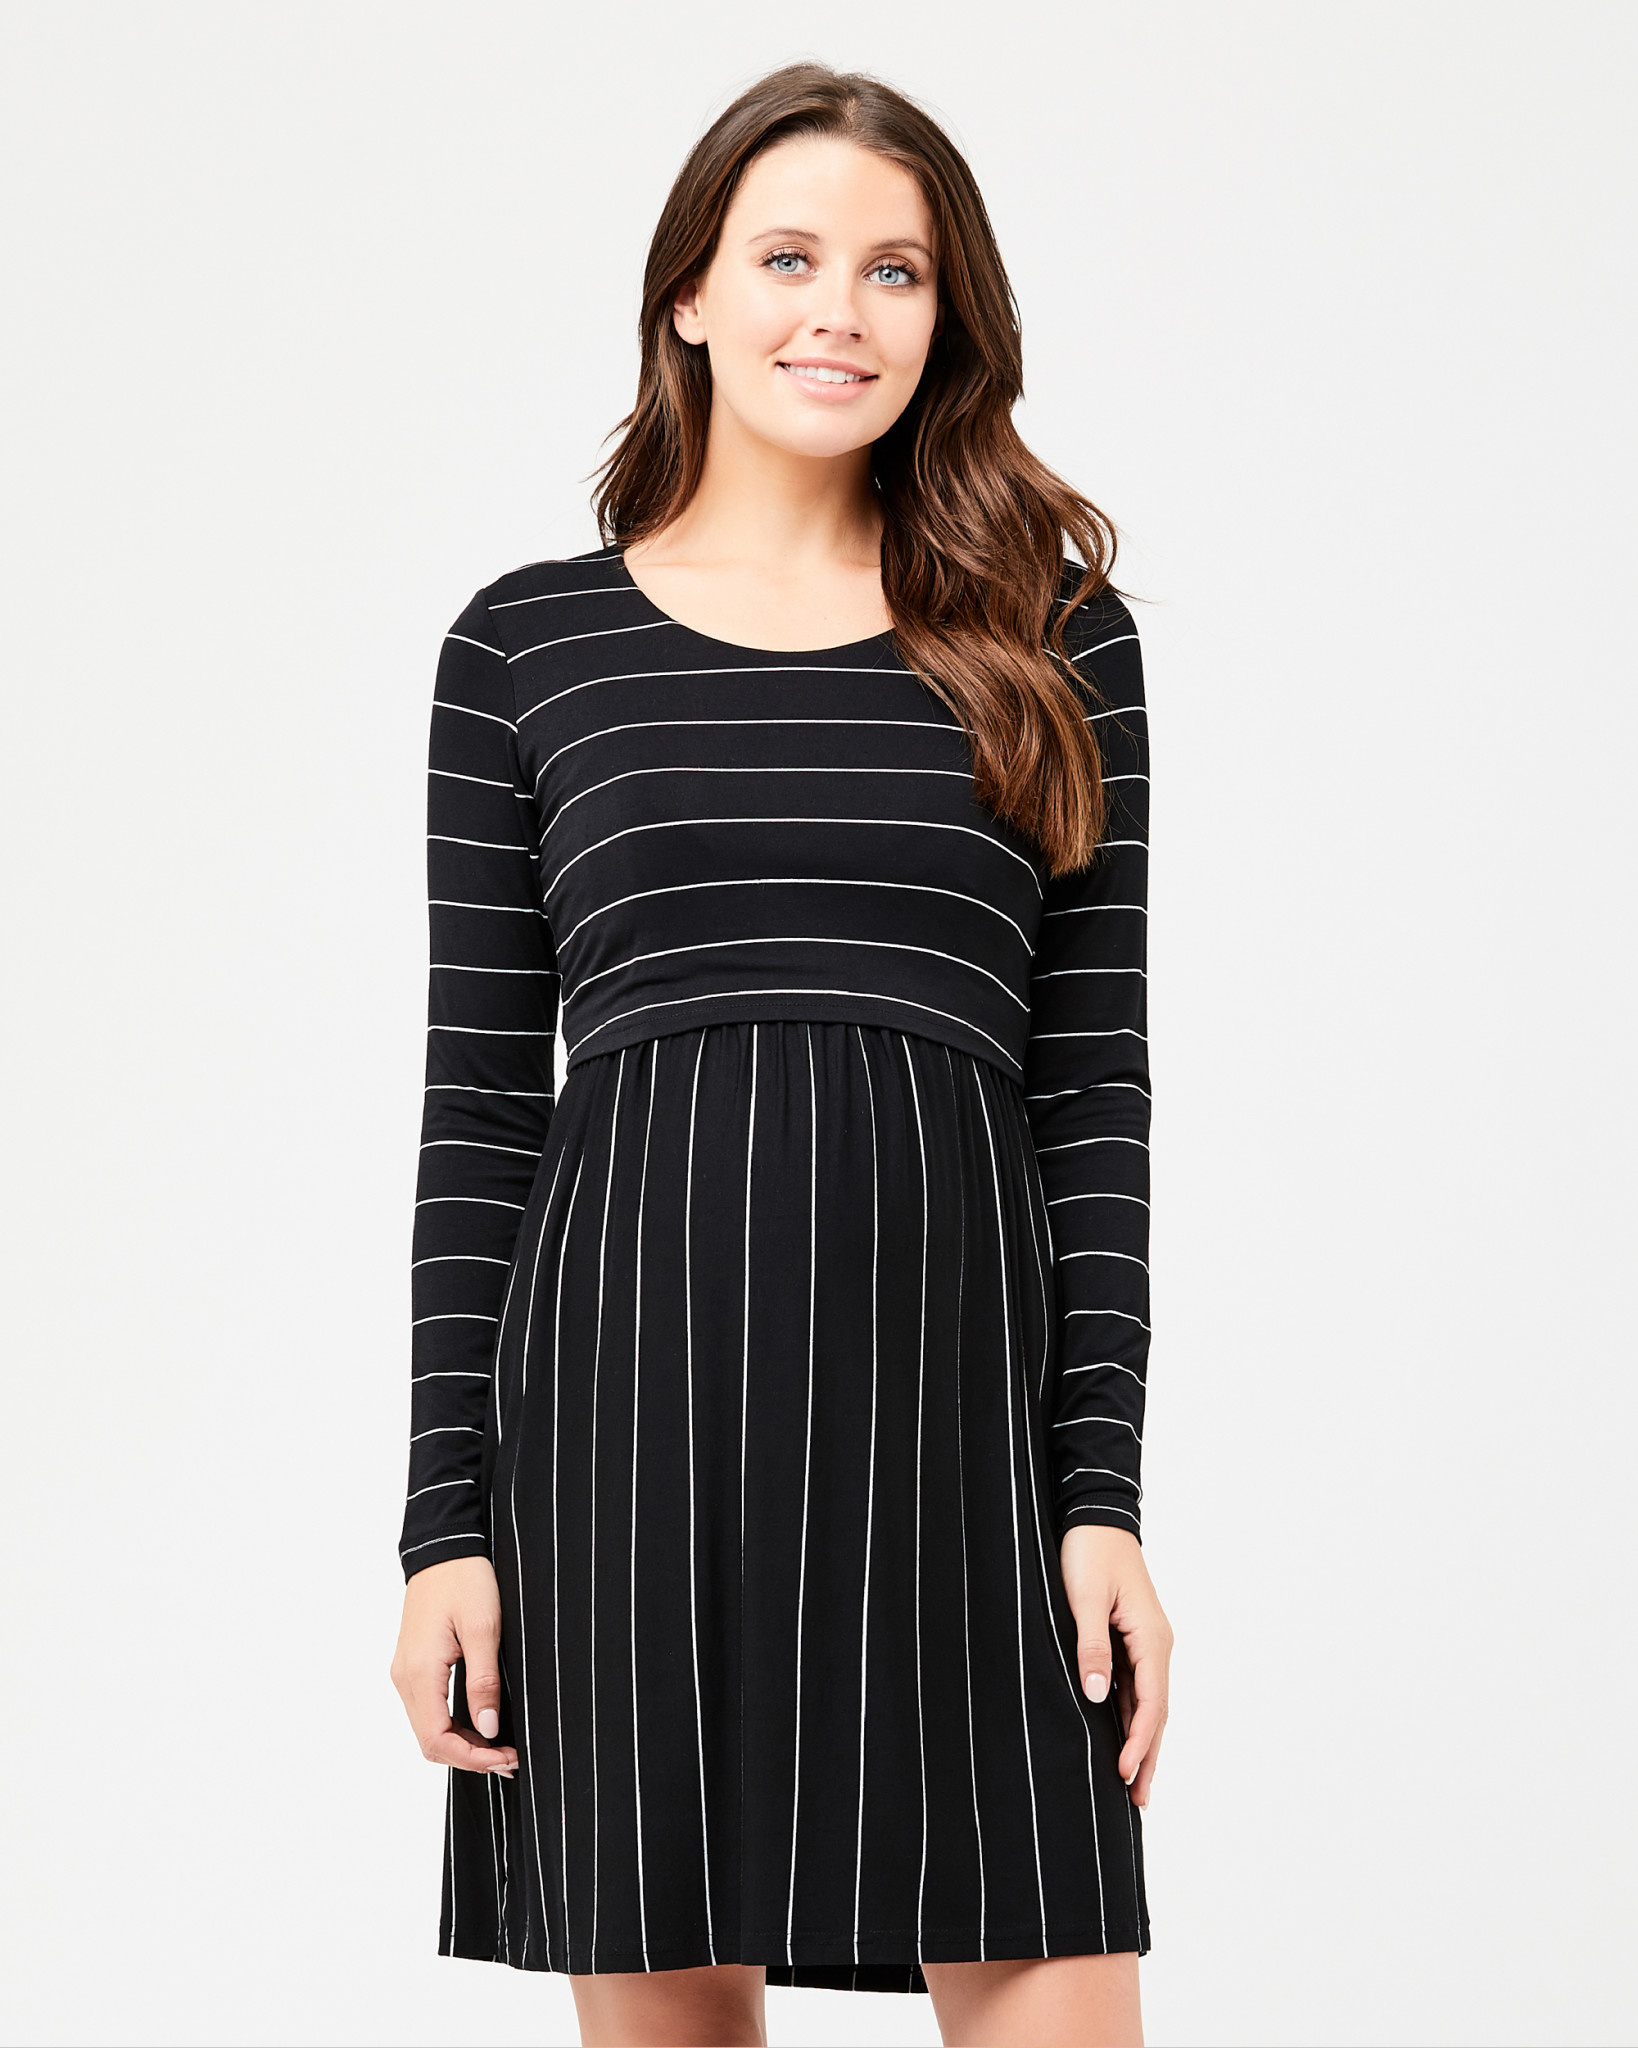 Sylvia Crop Top Nursing Dress